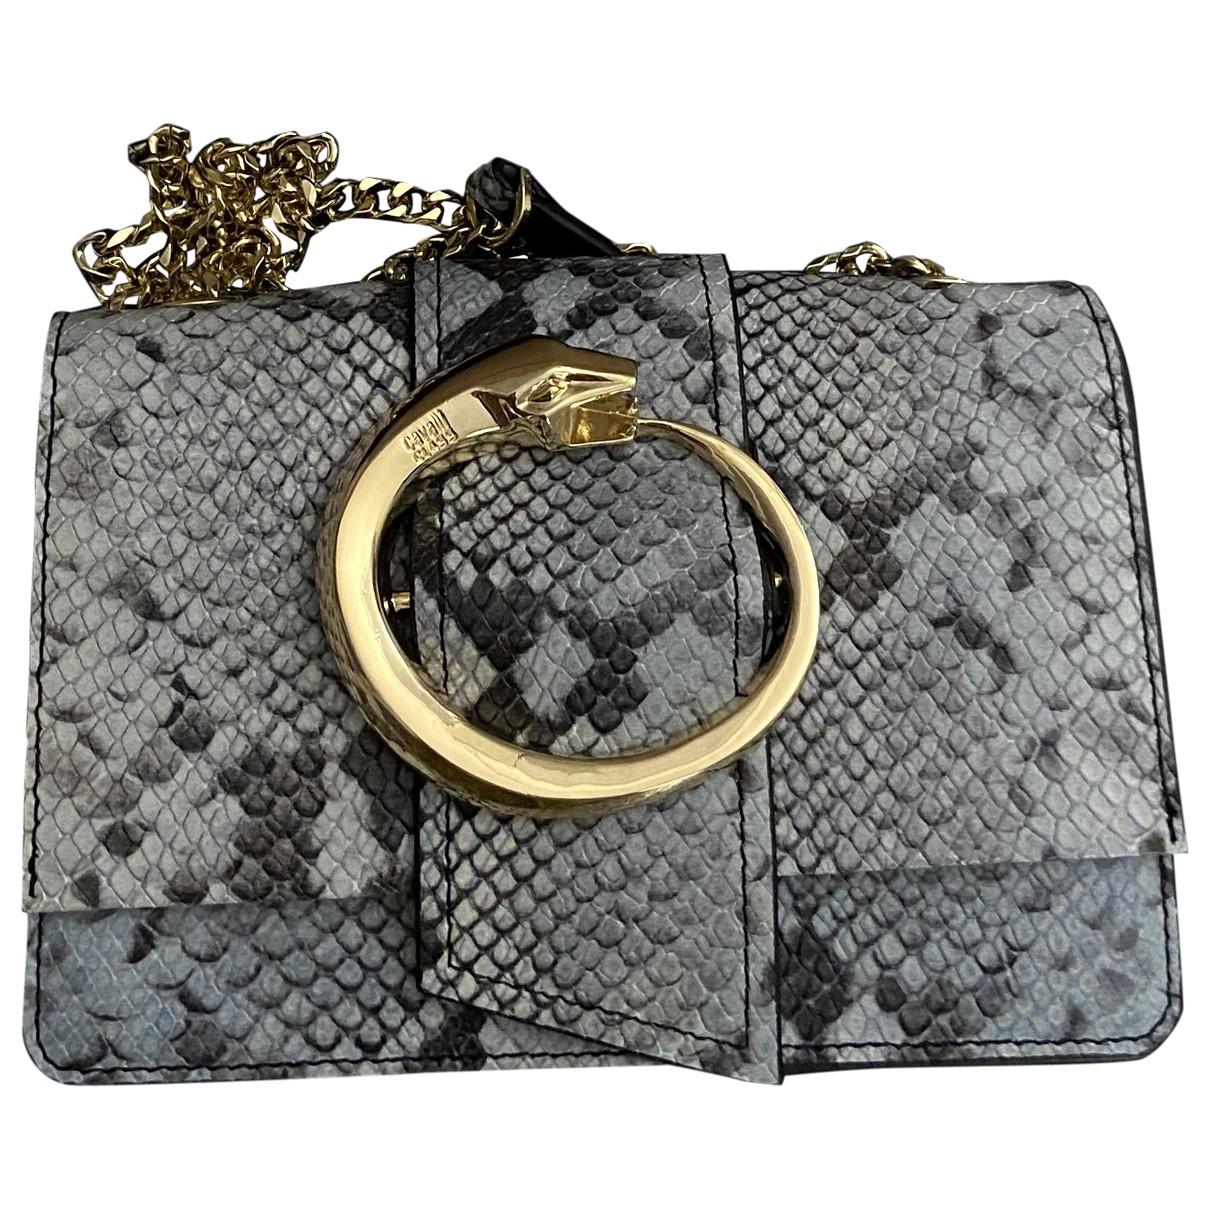 Roberto Cavalli \N Blue Leather handbag for Women \N